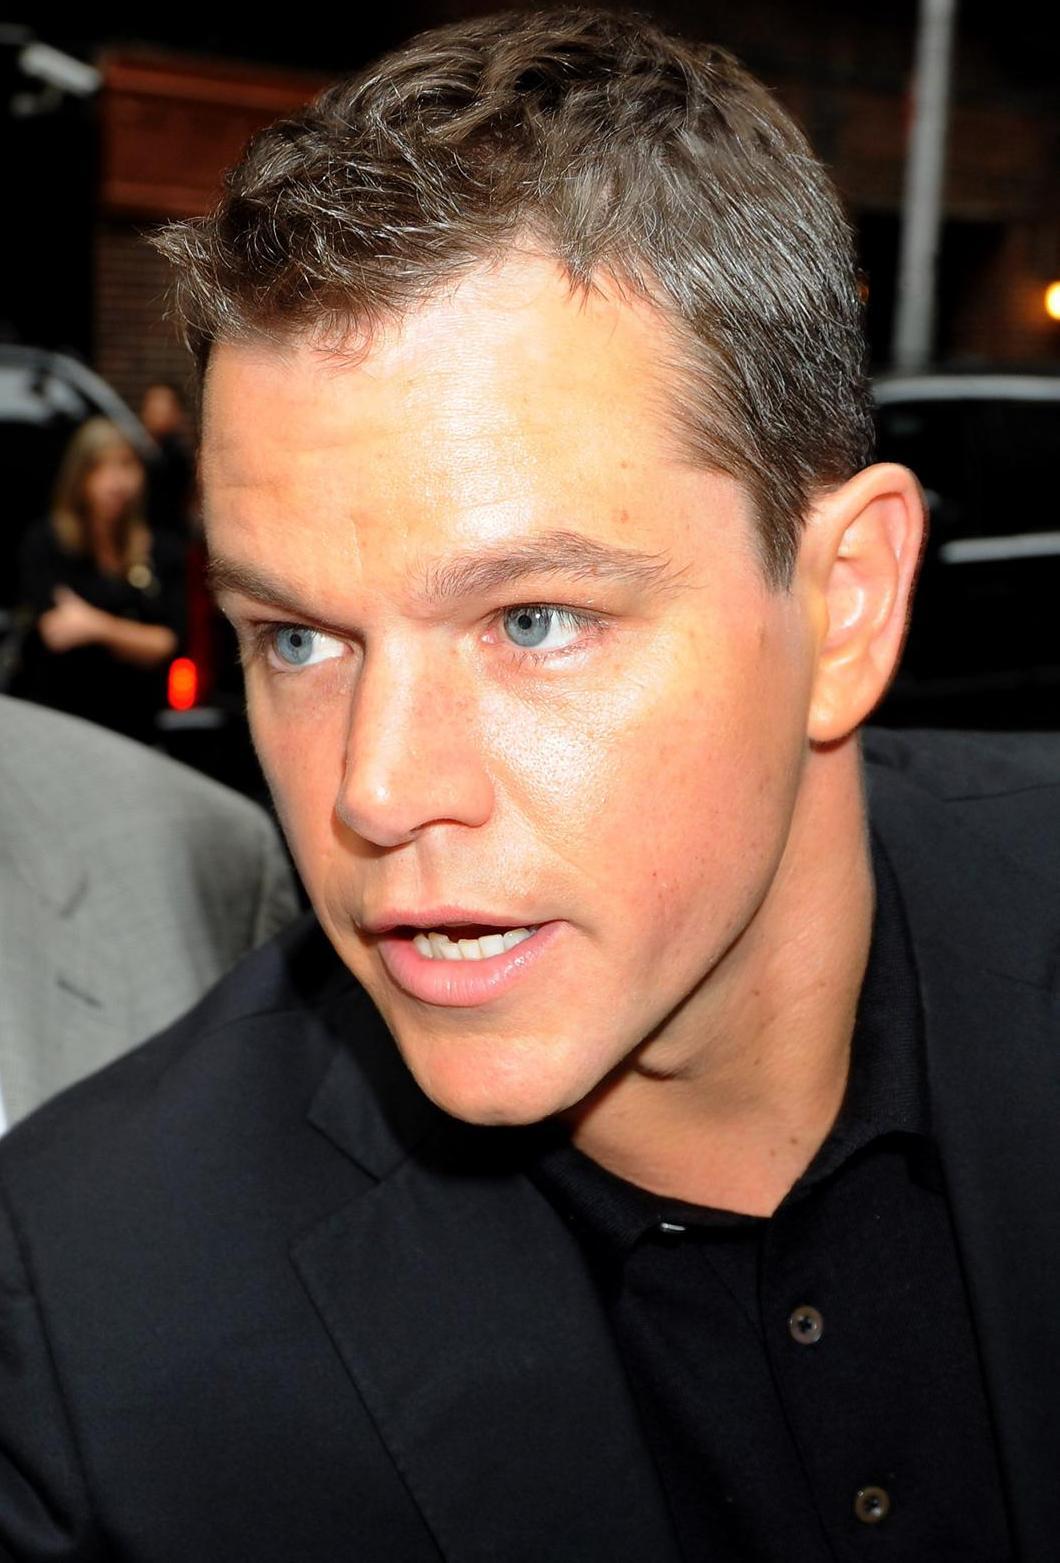 Matt Damon The Male Celebrity